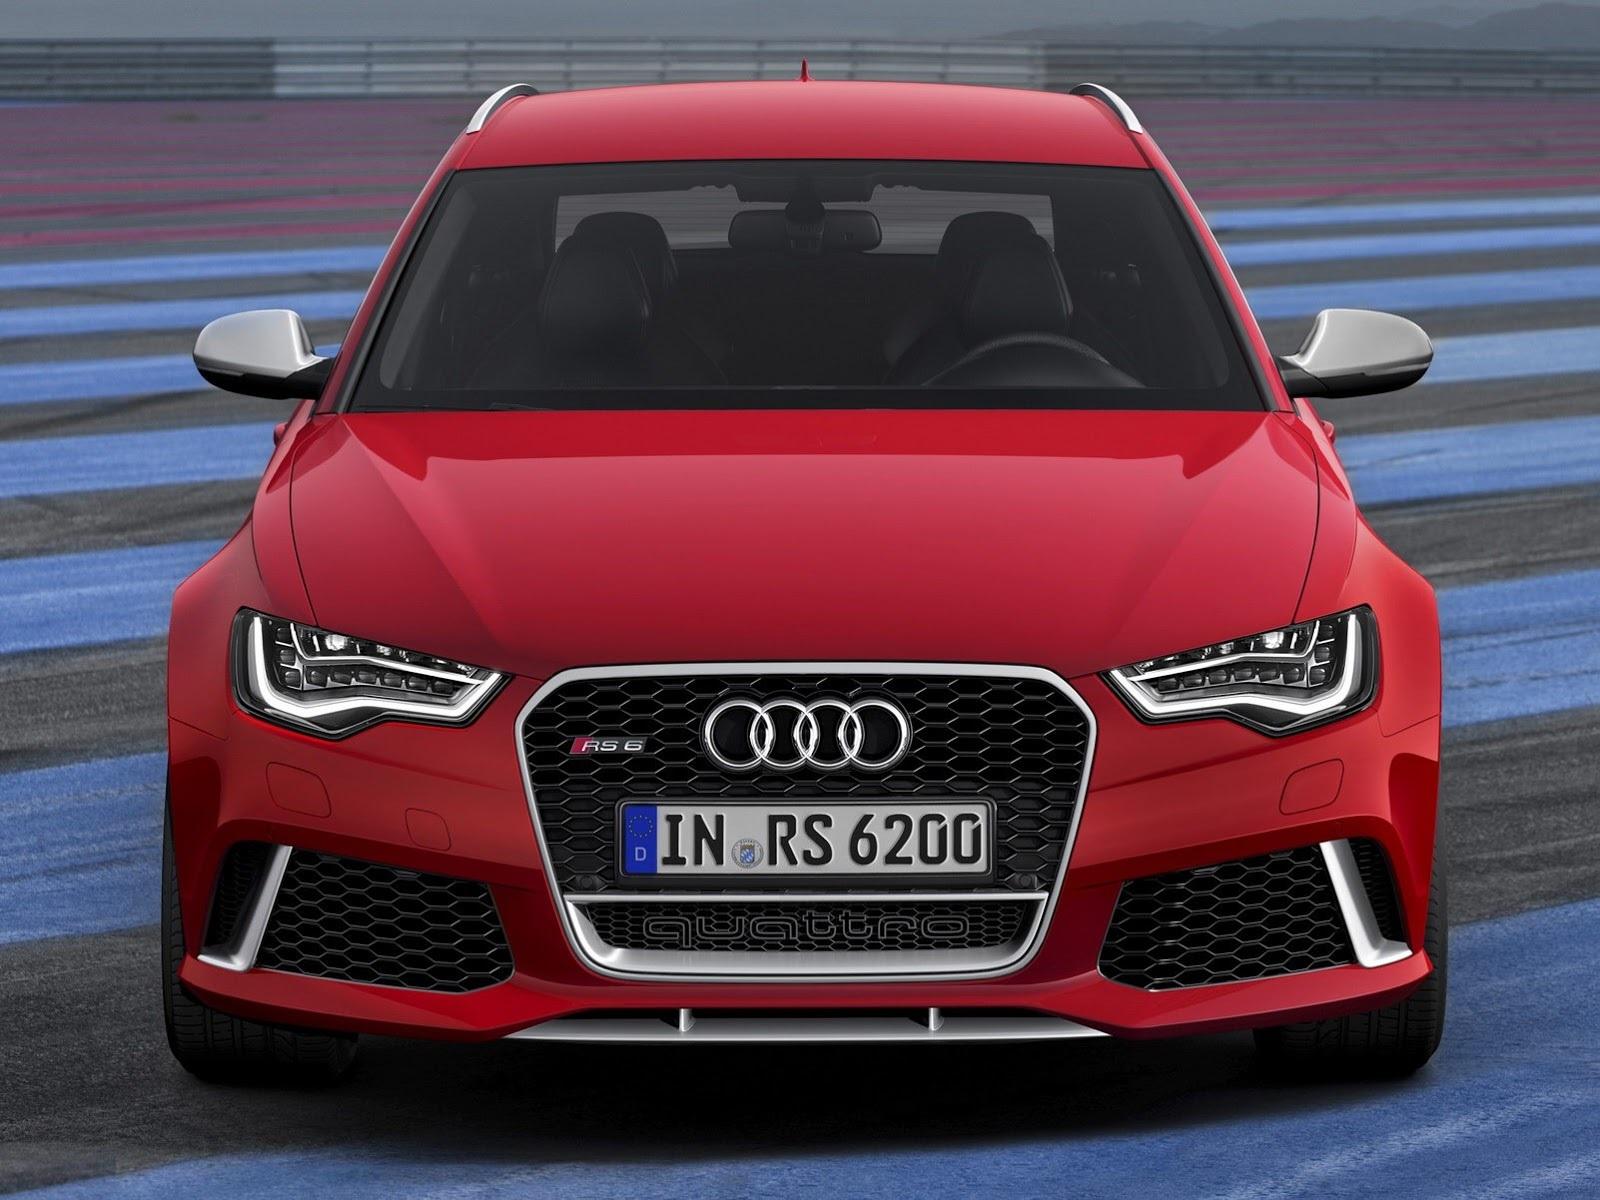 Foto de Audi RS6 Avant 2013 (6/8)